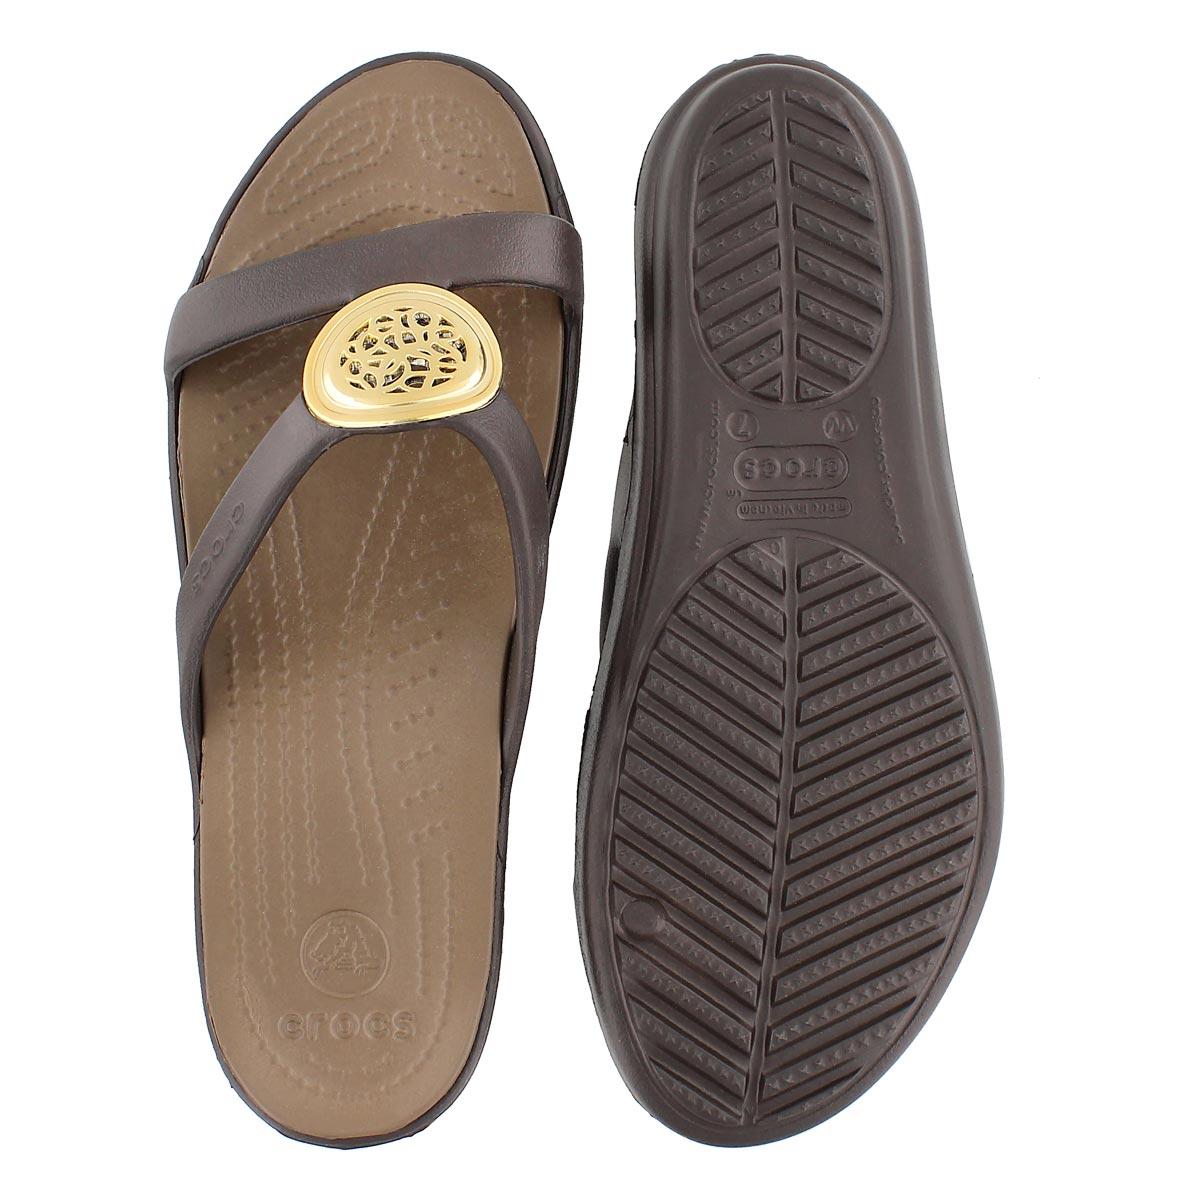 Lds Sanrah Circle espresso slide sandal